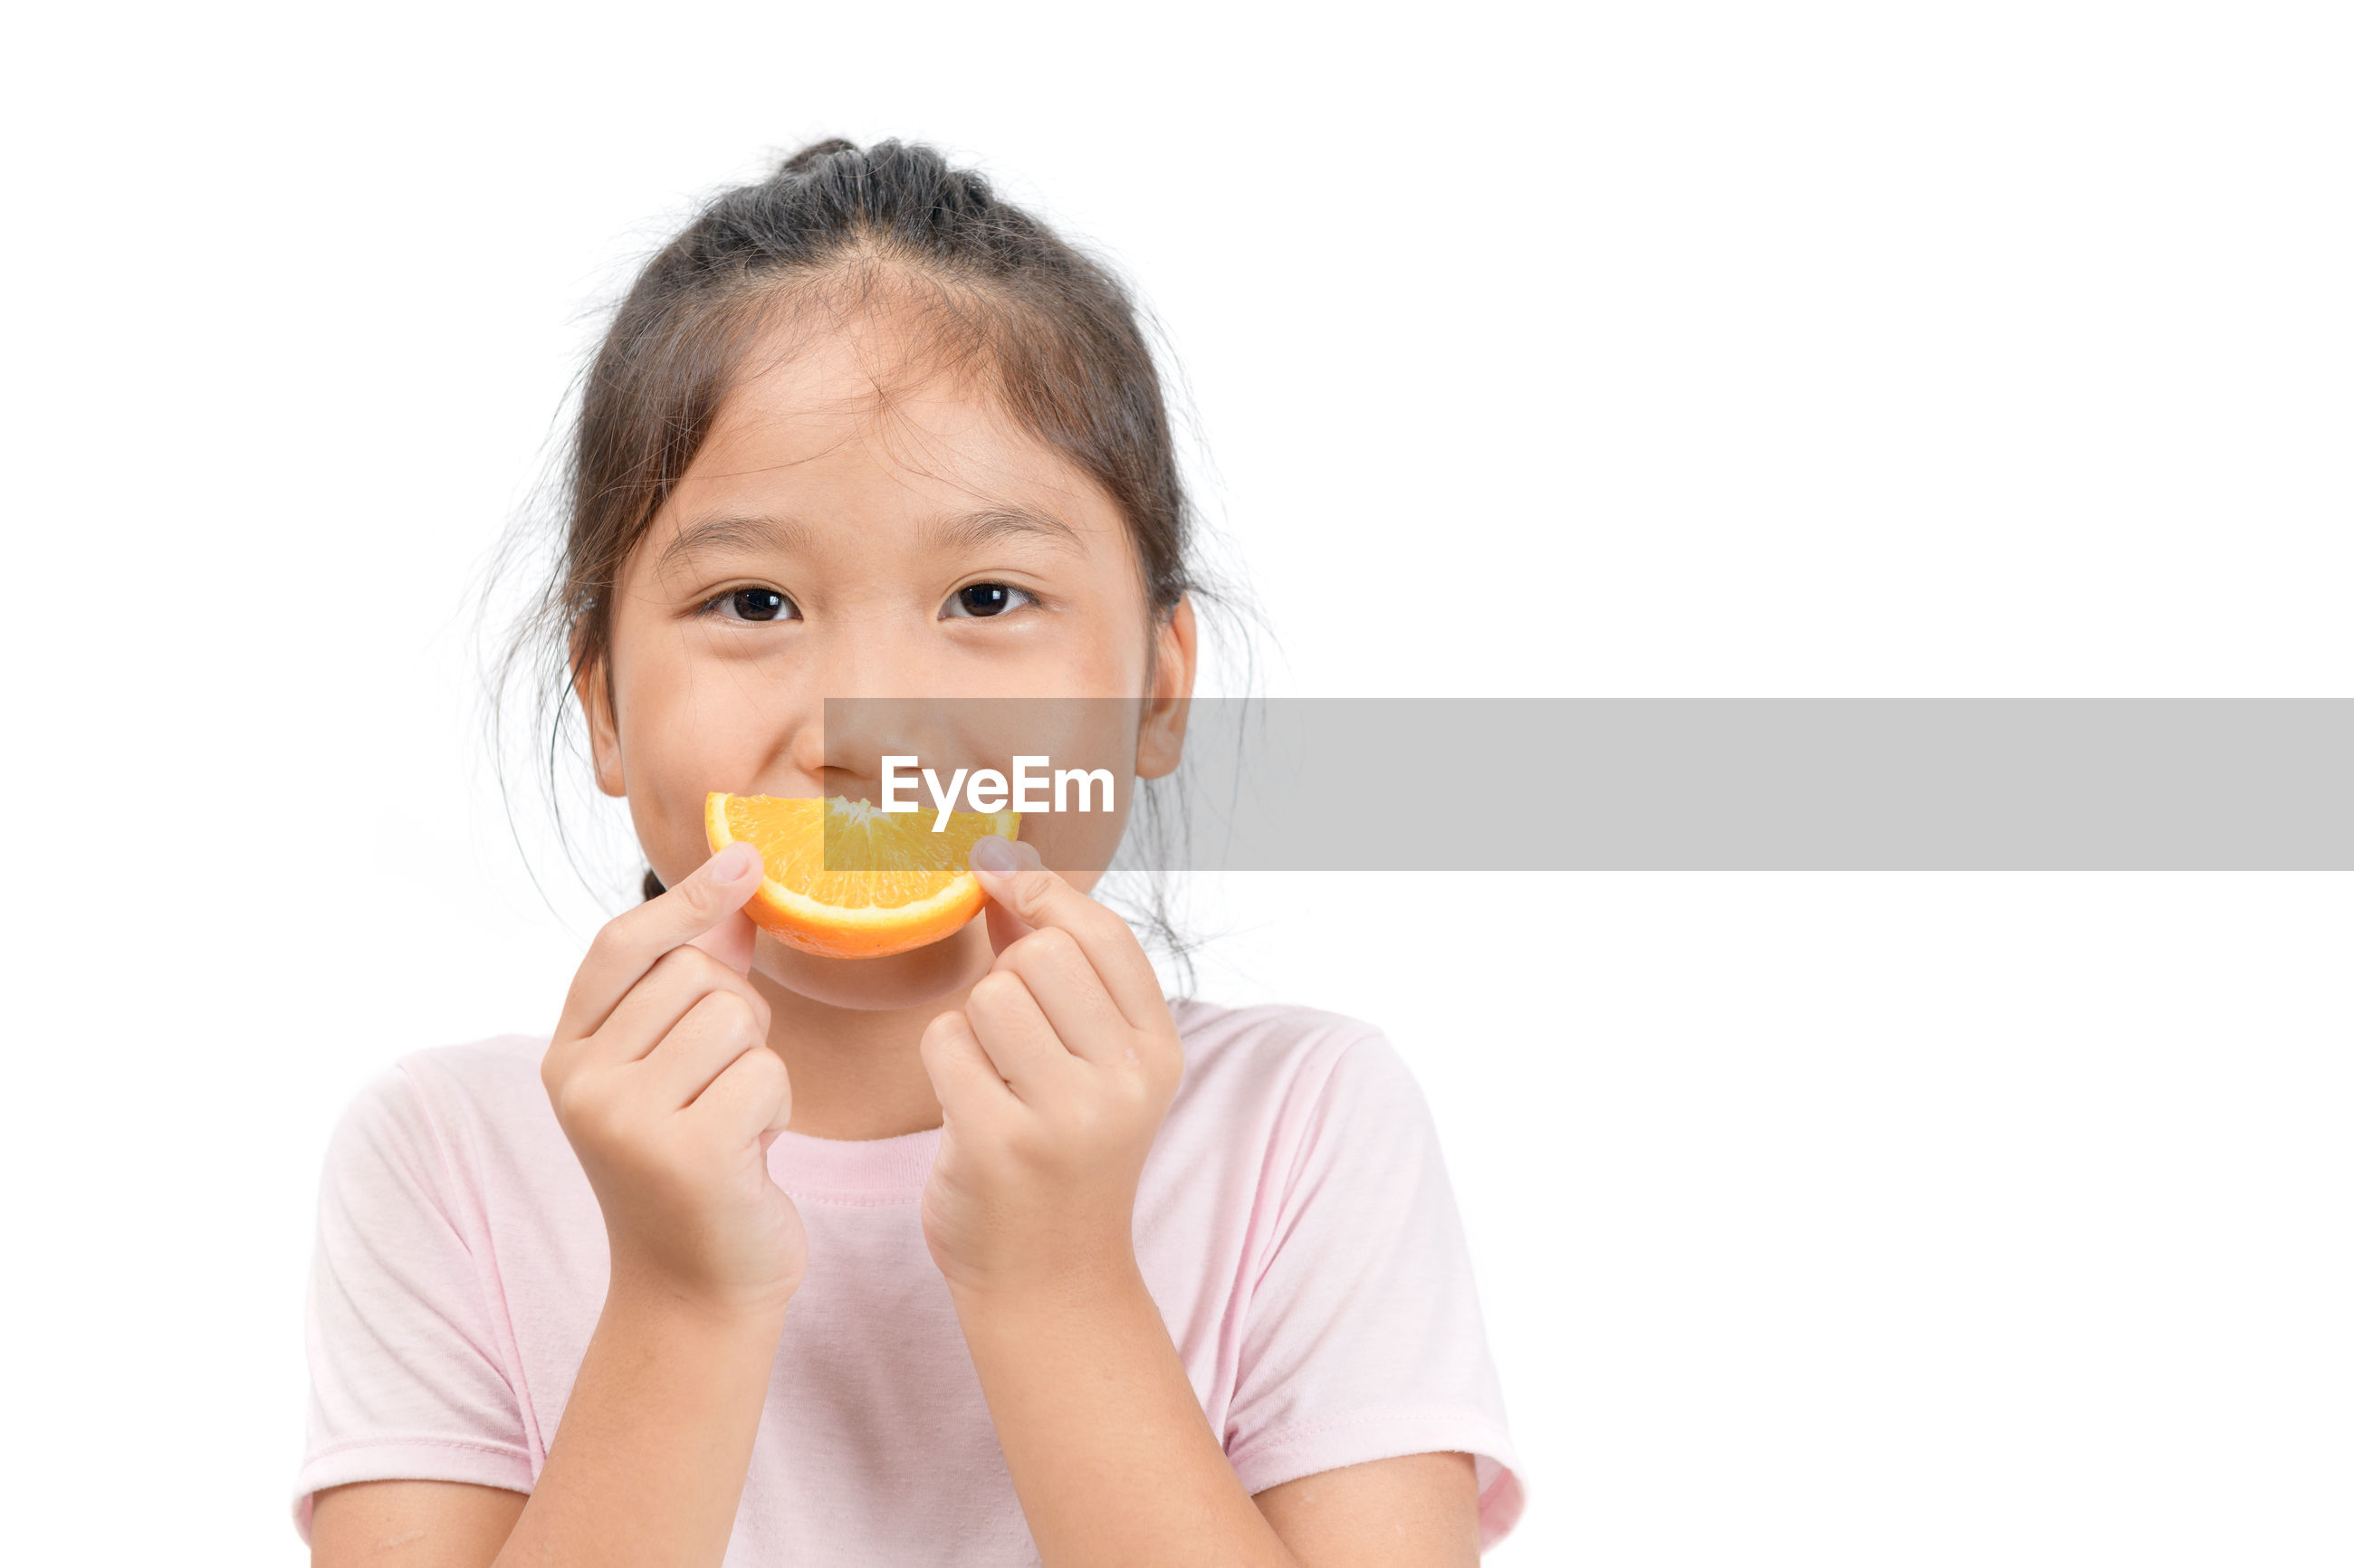 Portrait of holding orange slice standing against white background